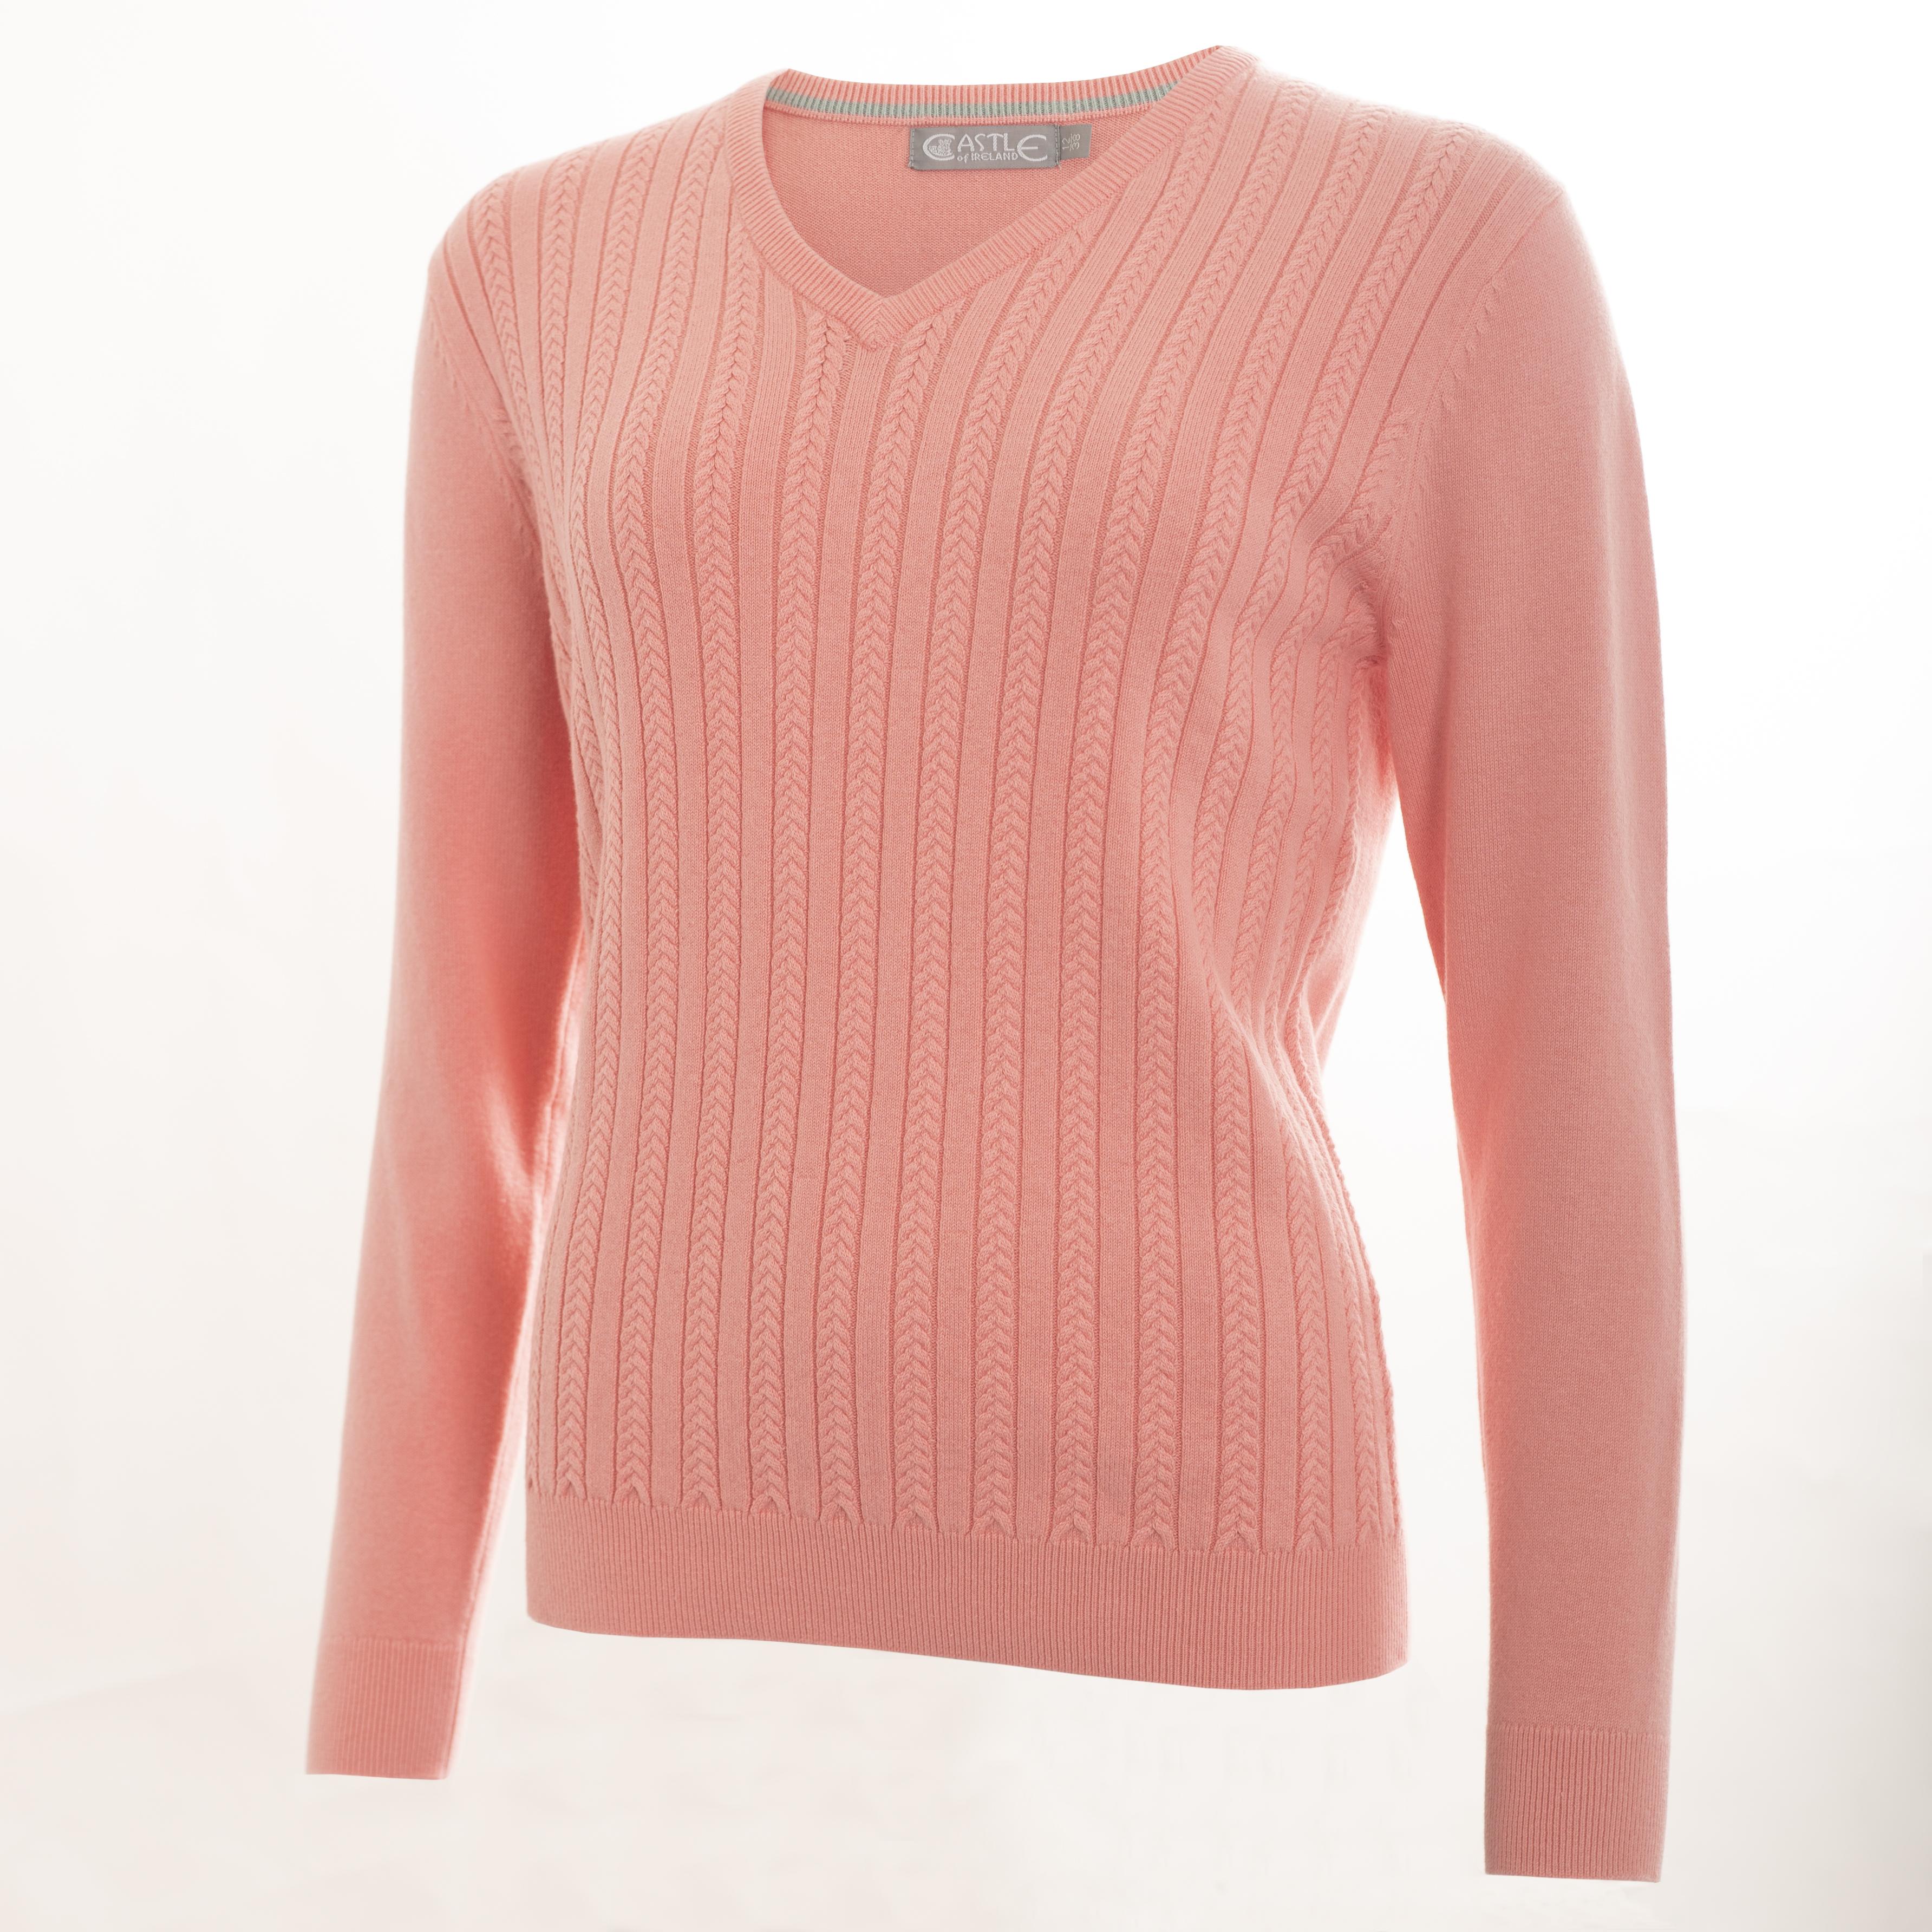 official best value 100% quality Colltex Designs Ltd. – Castle of Ireland knitwear, Irish ...